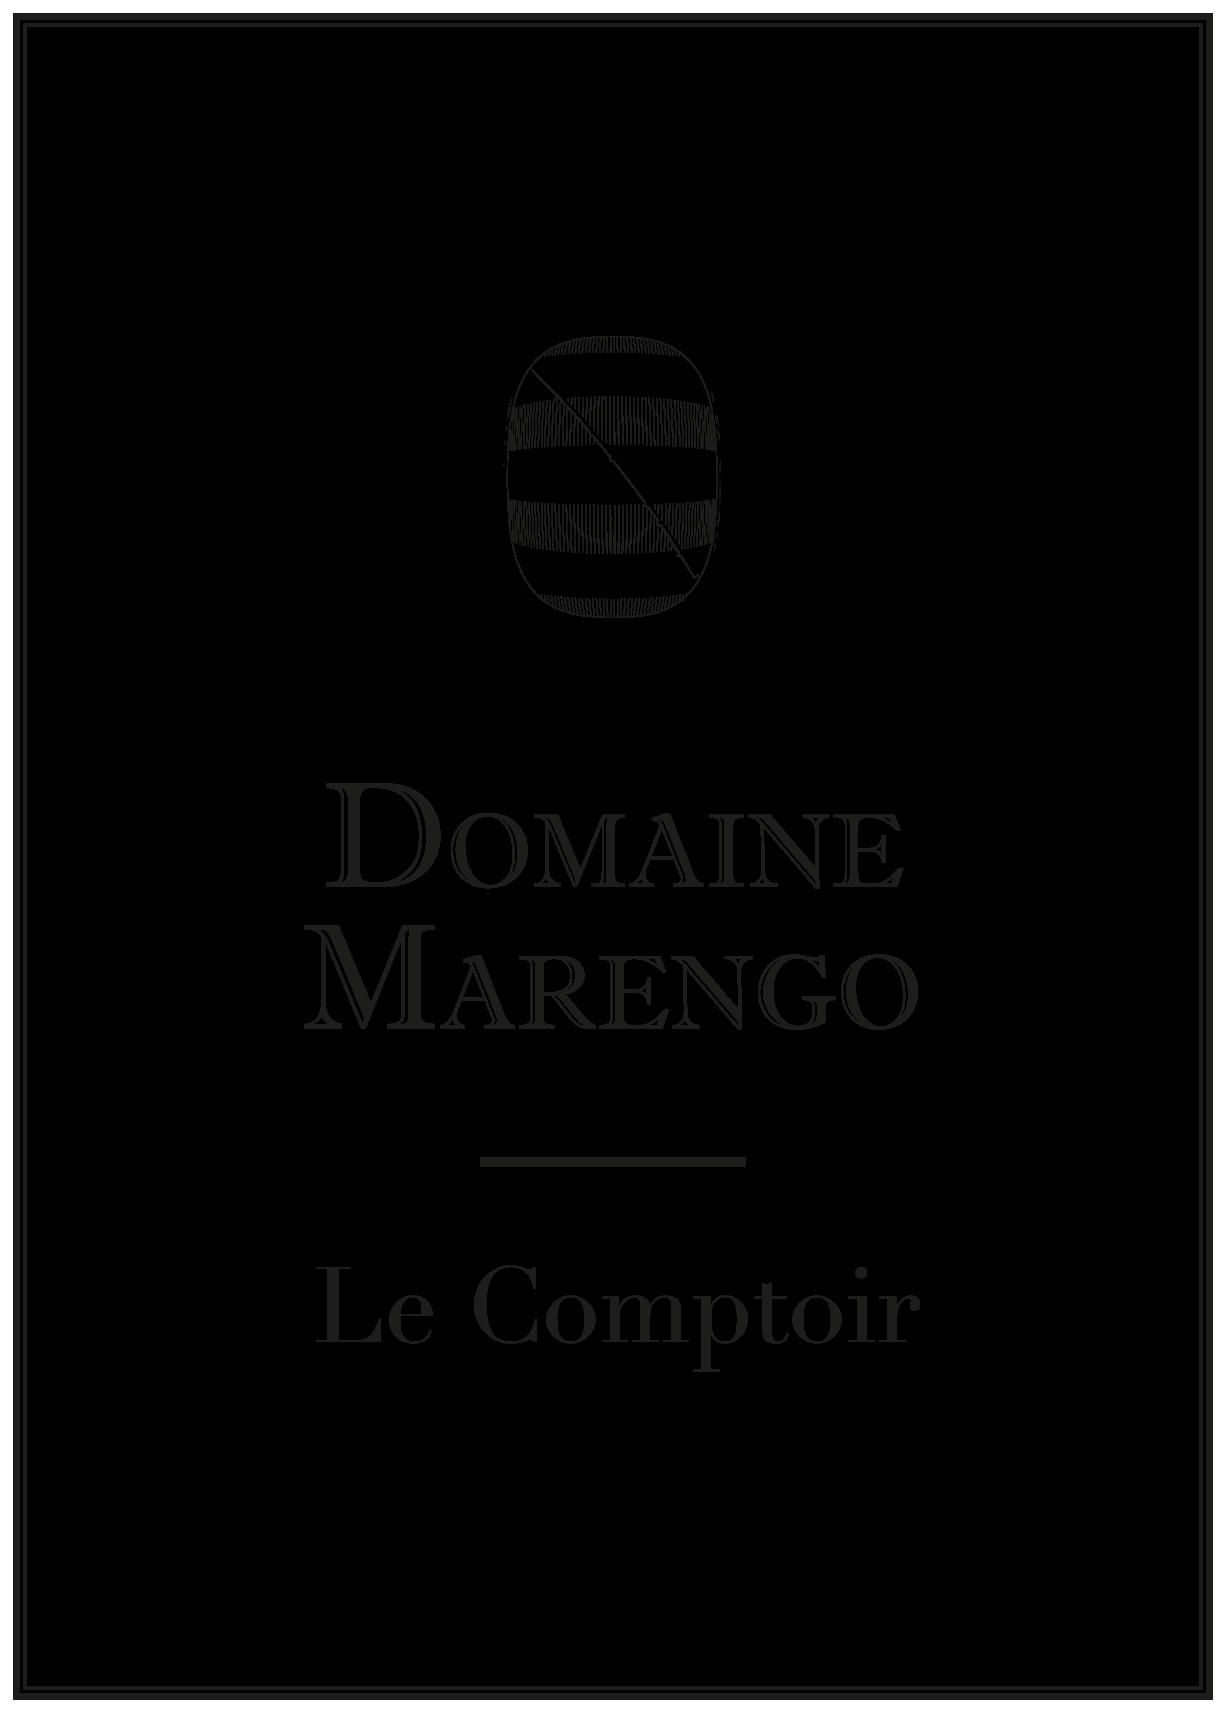 Domaine Marengo